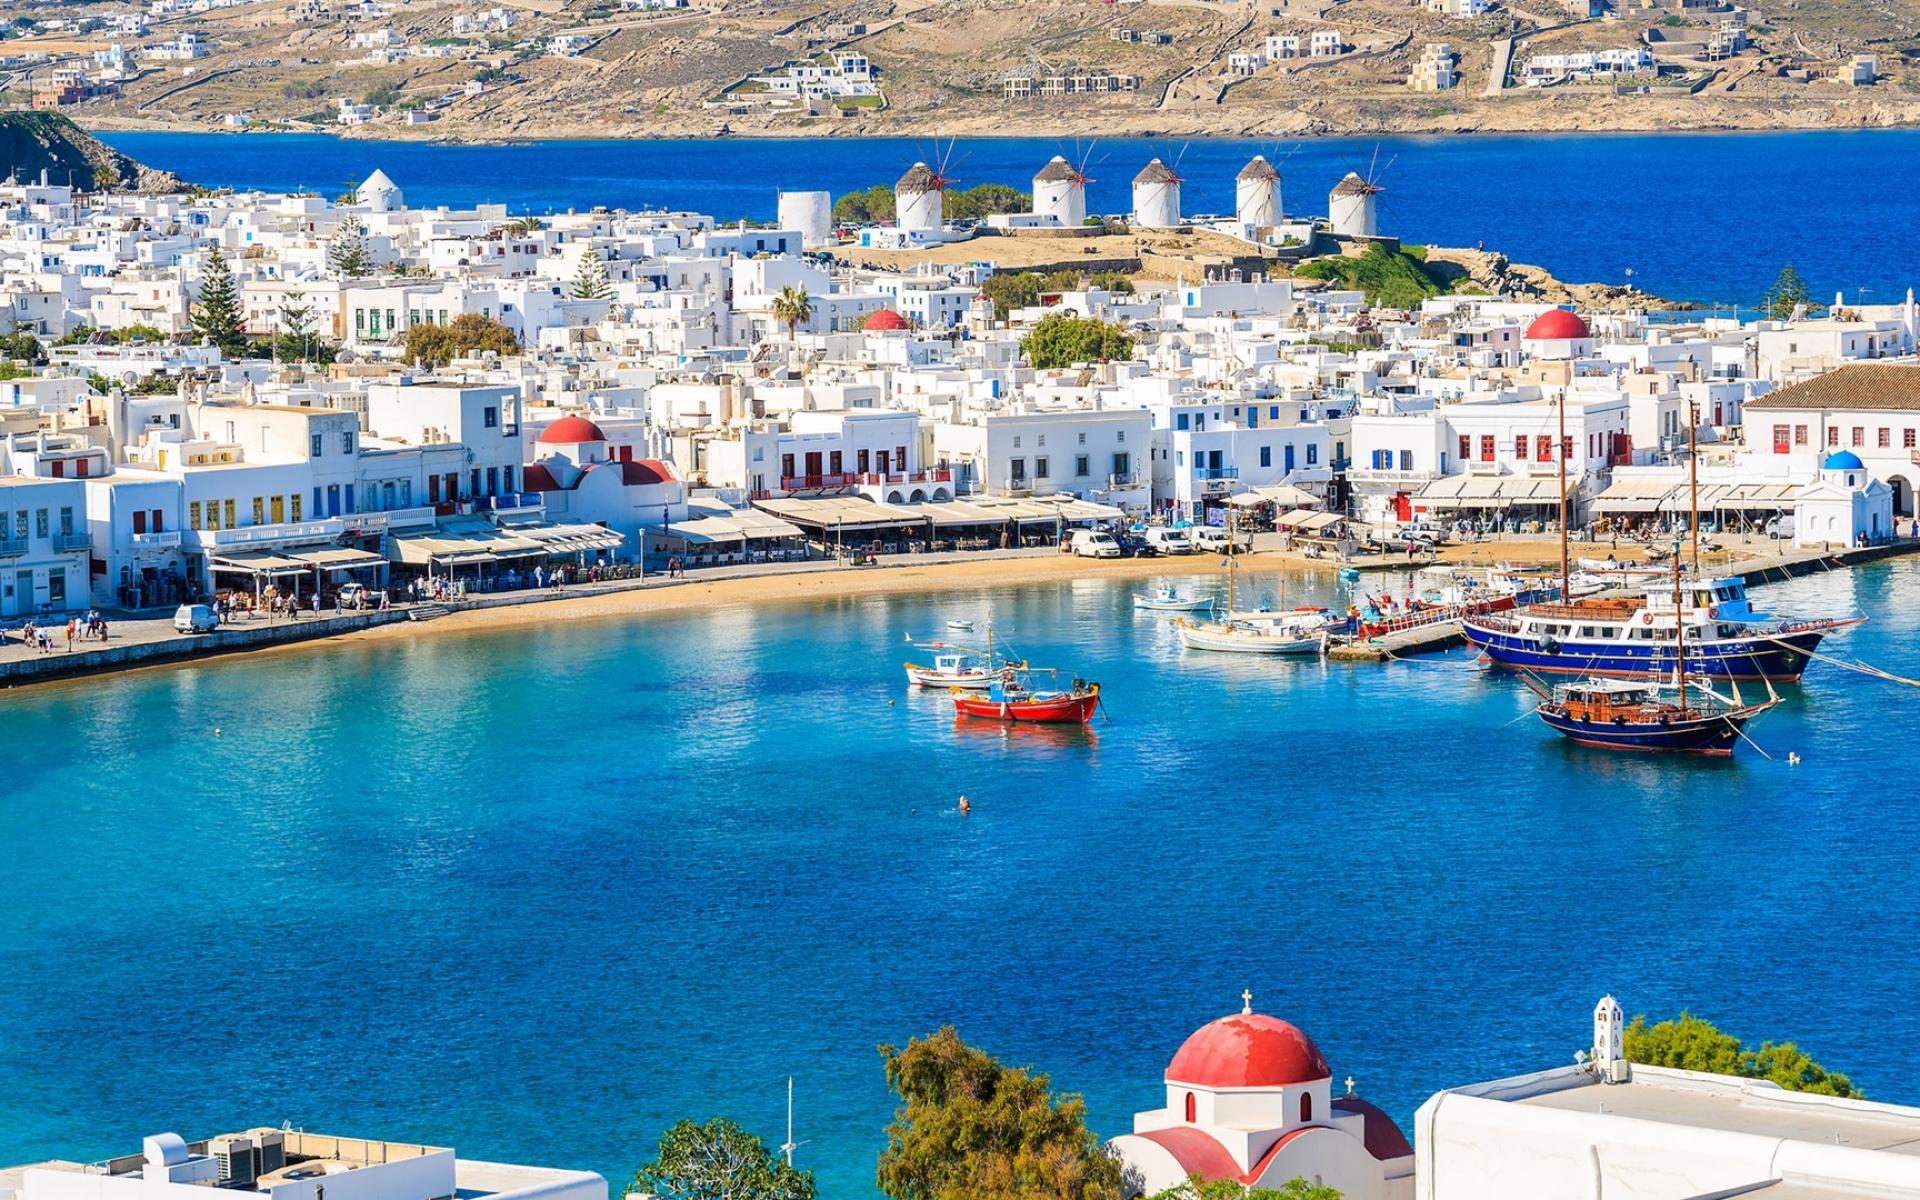 VIAJE A DUBAI Y GRECIA CON MYKONOS, SANTORINI & CRETA